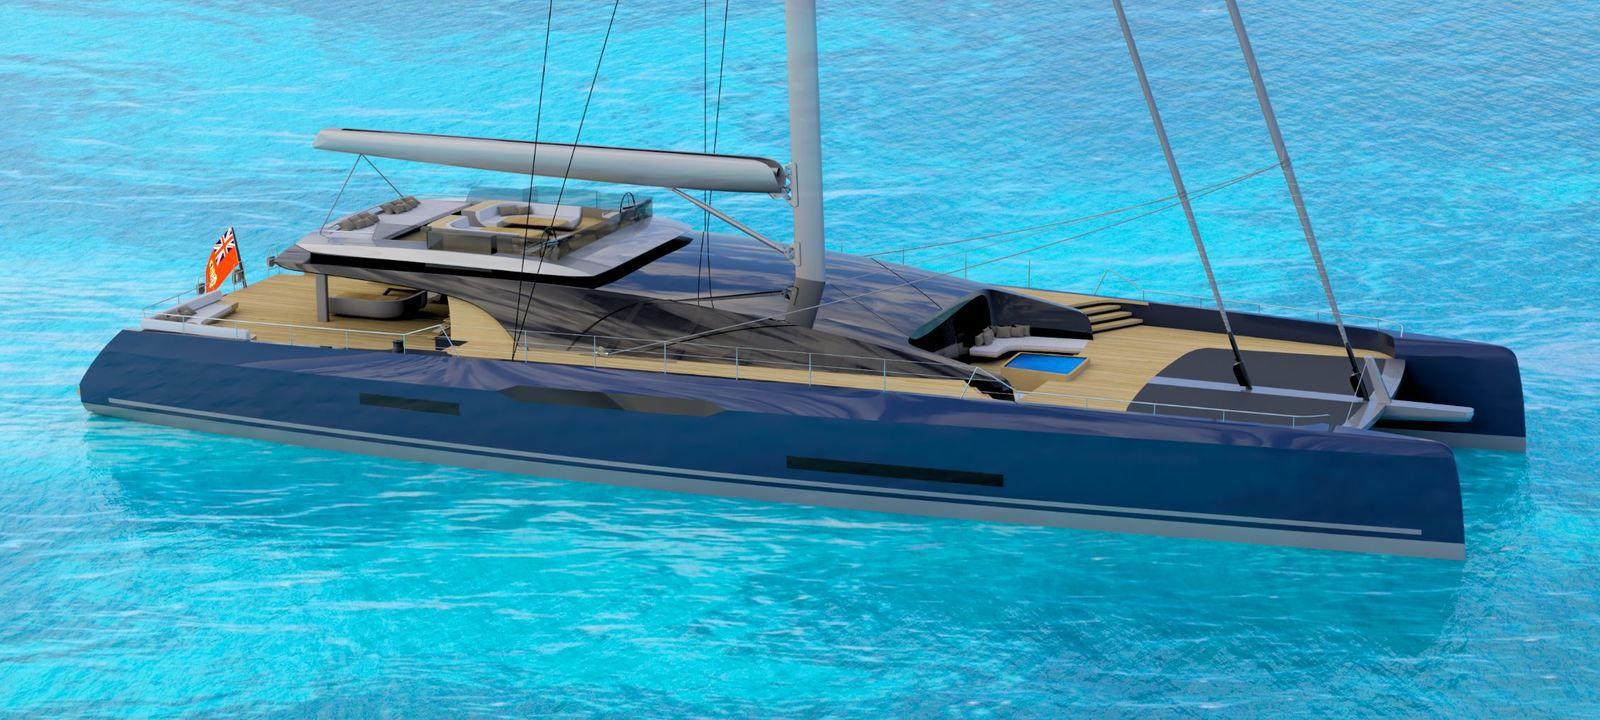 Sunreef and Malcolm McKeon unveil a superyacht catamaran, the Sunreef MM460CAT